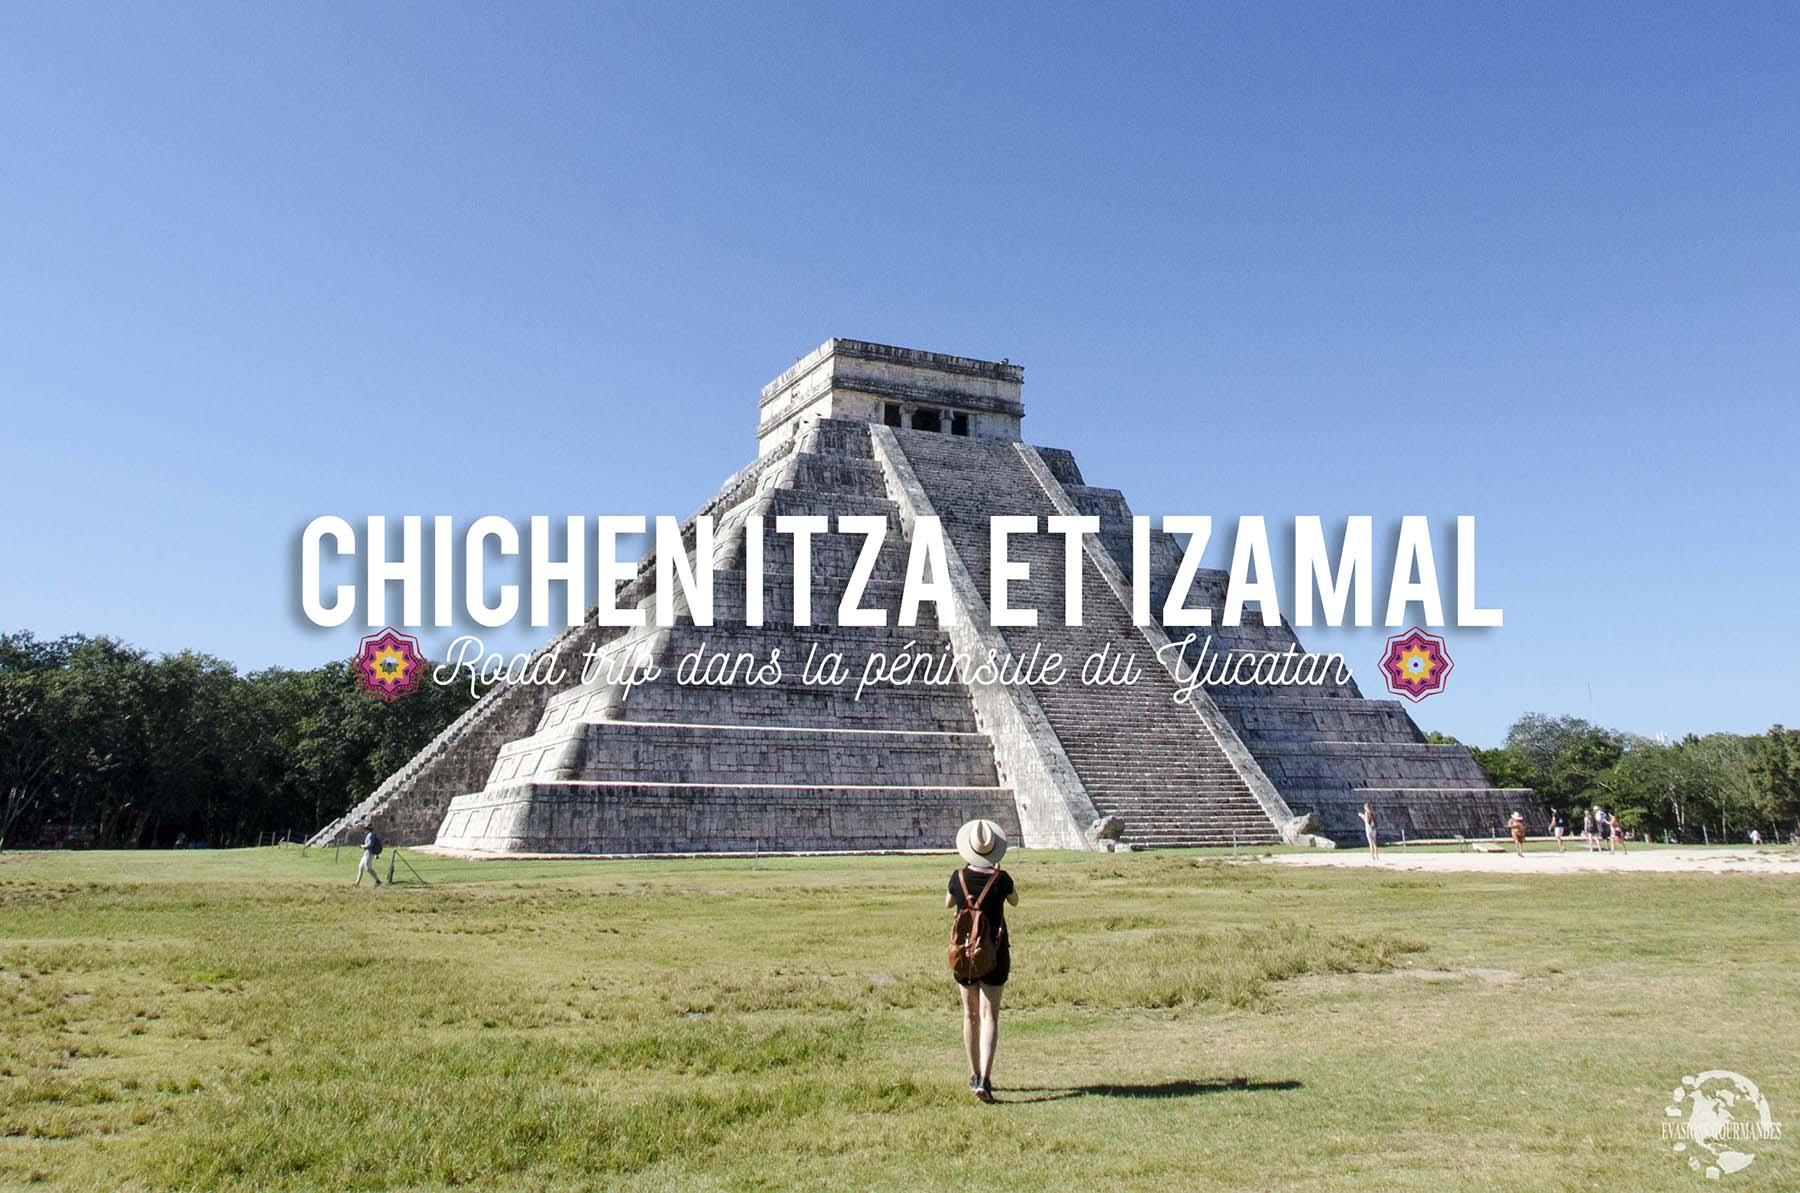 Chichen Itza et Izamal